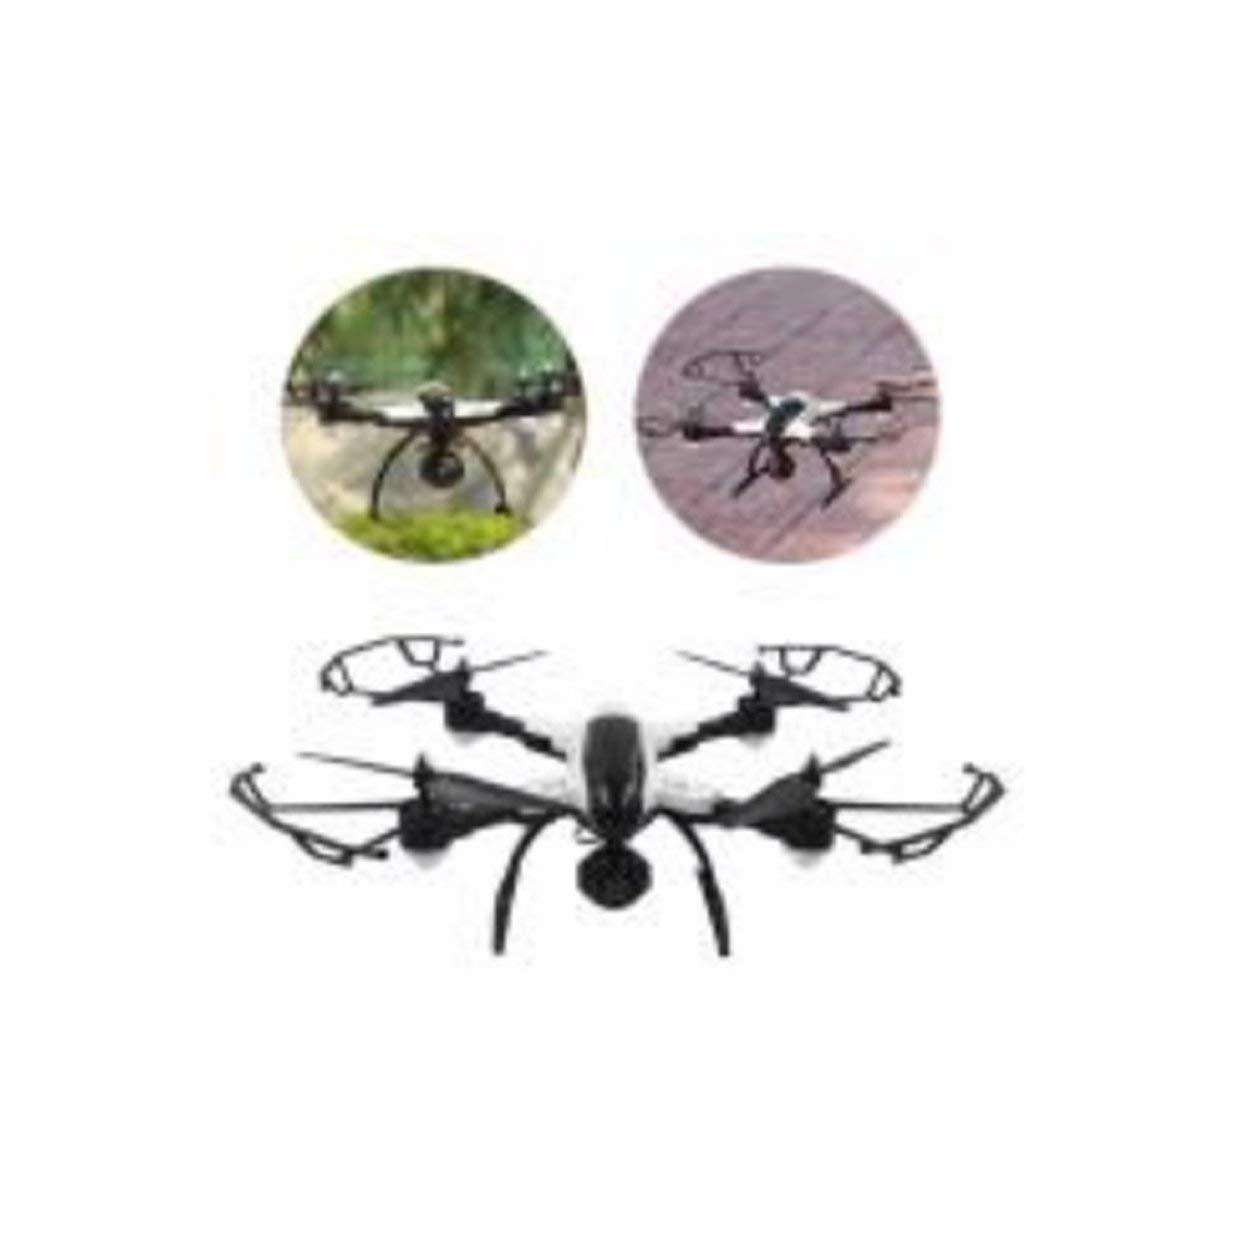 Dailyinshop X33C-1 Selfie FPV Faltbare RC Drone Höhe Halten 0.3MP WiFi Kamera 3D Flips (Farbe: Schwarz-Weiß)